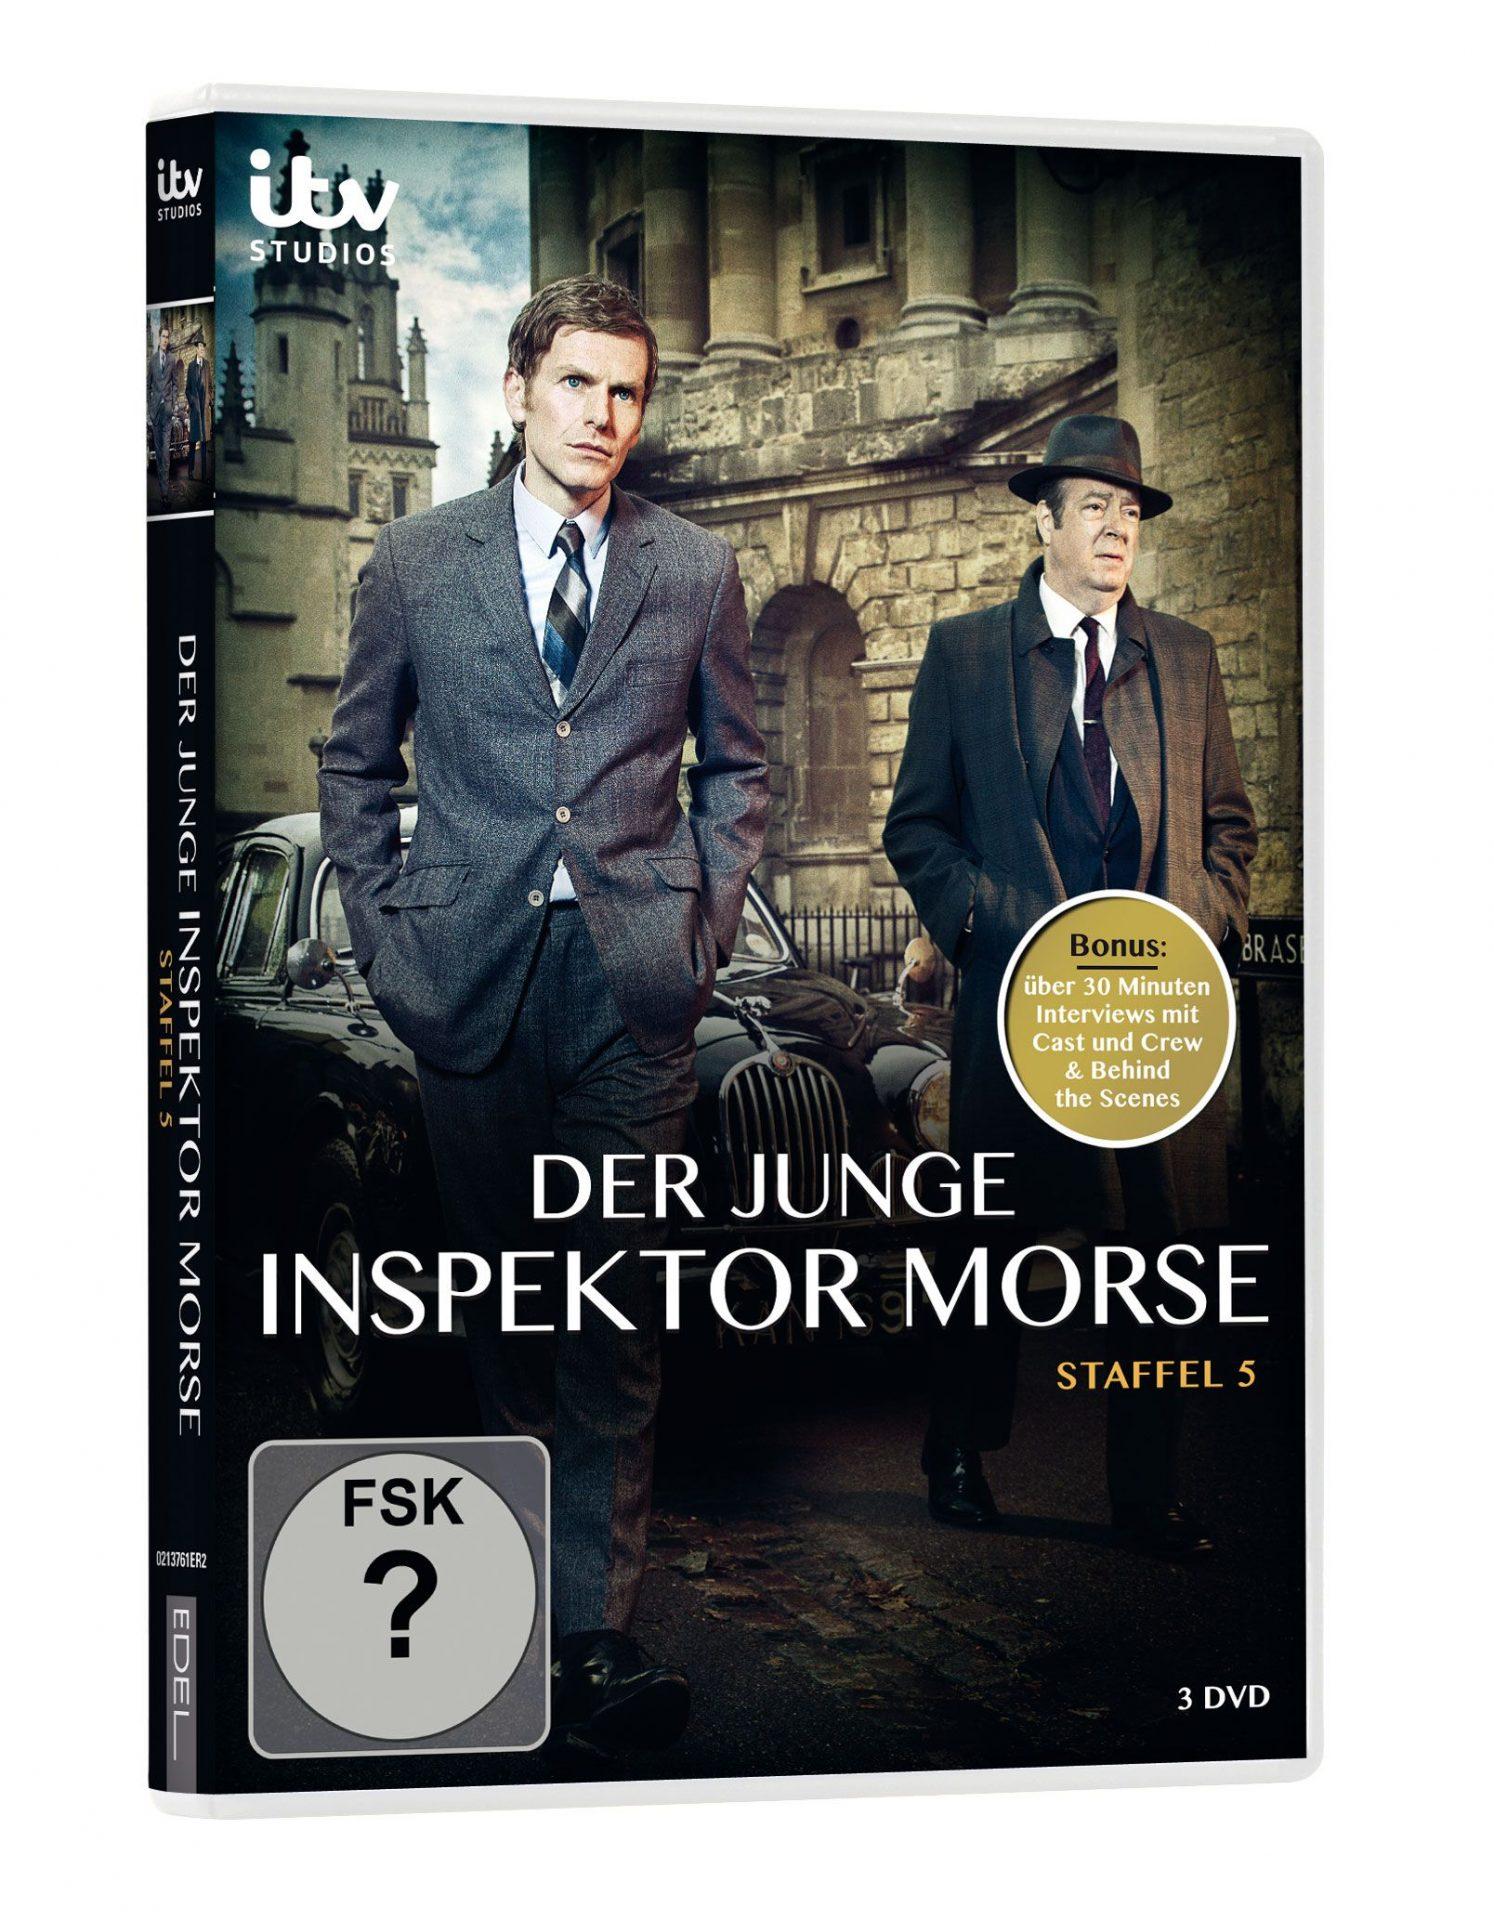 Der junge Inspektor Morse Staffel 5